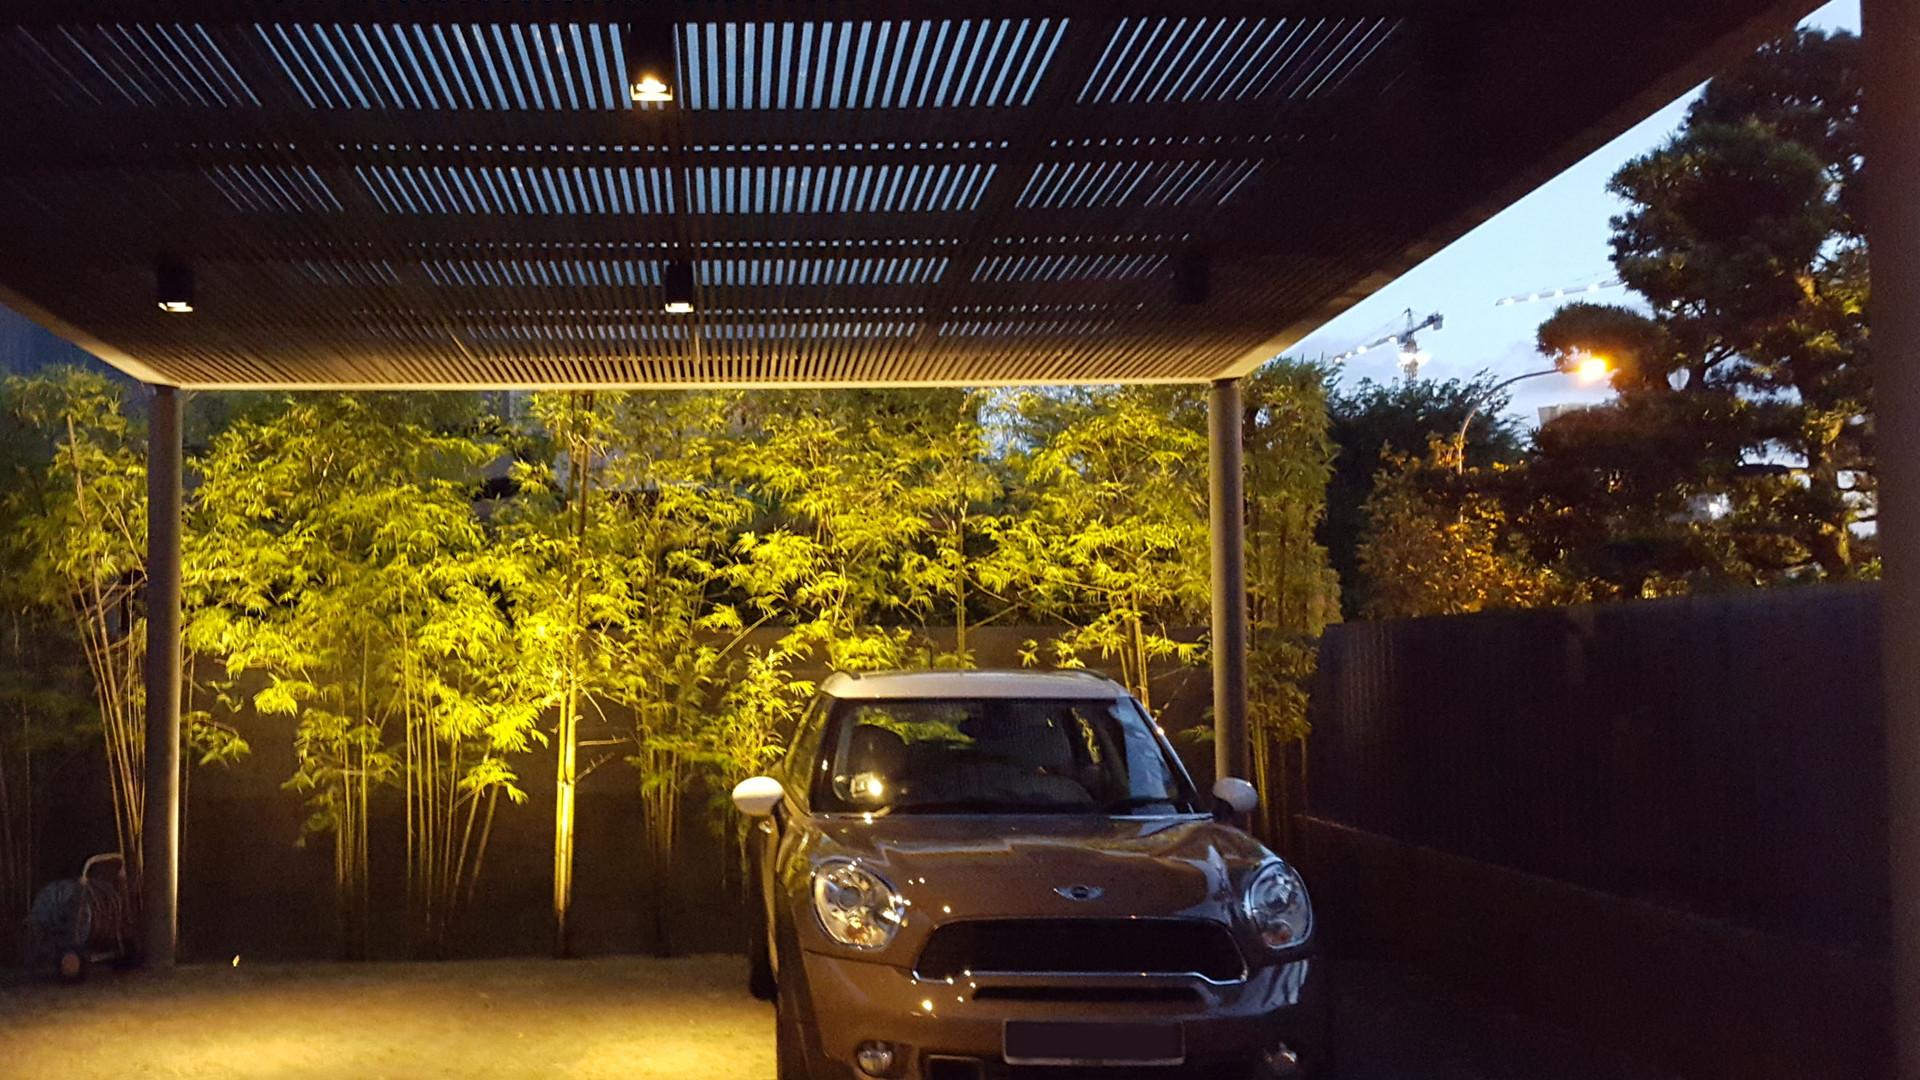 Lighting-Contrast Ratio-Residential Car